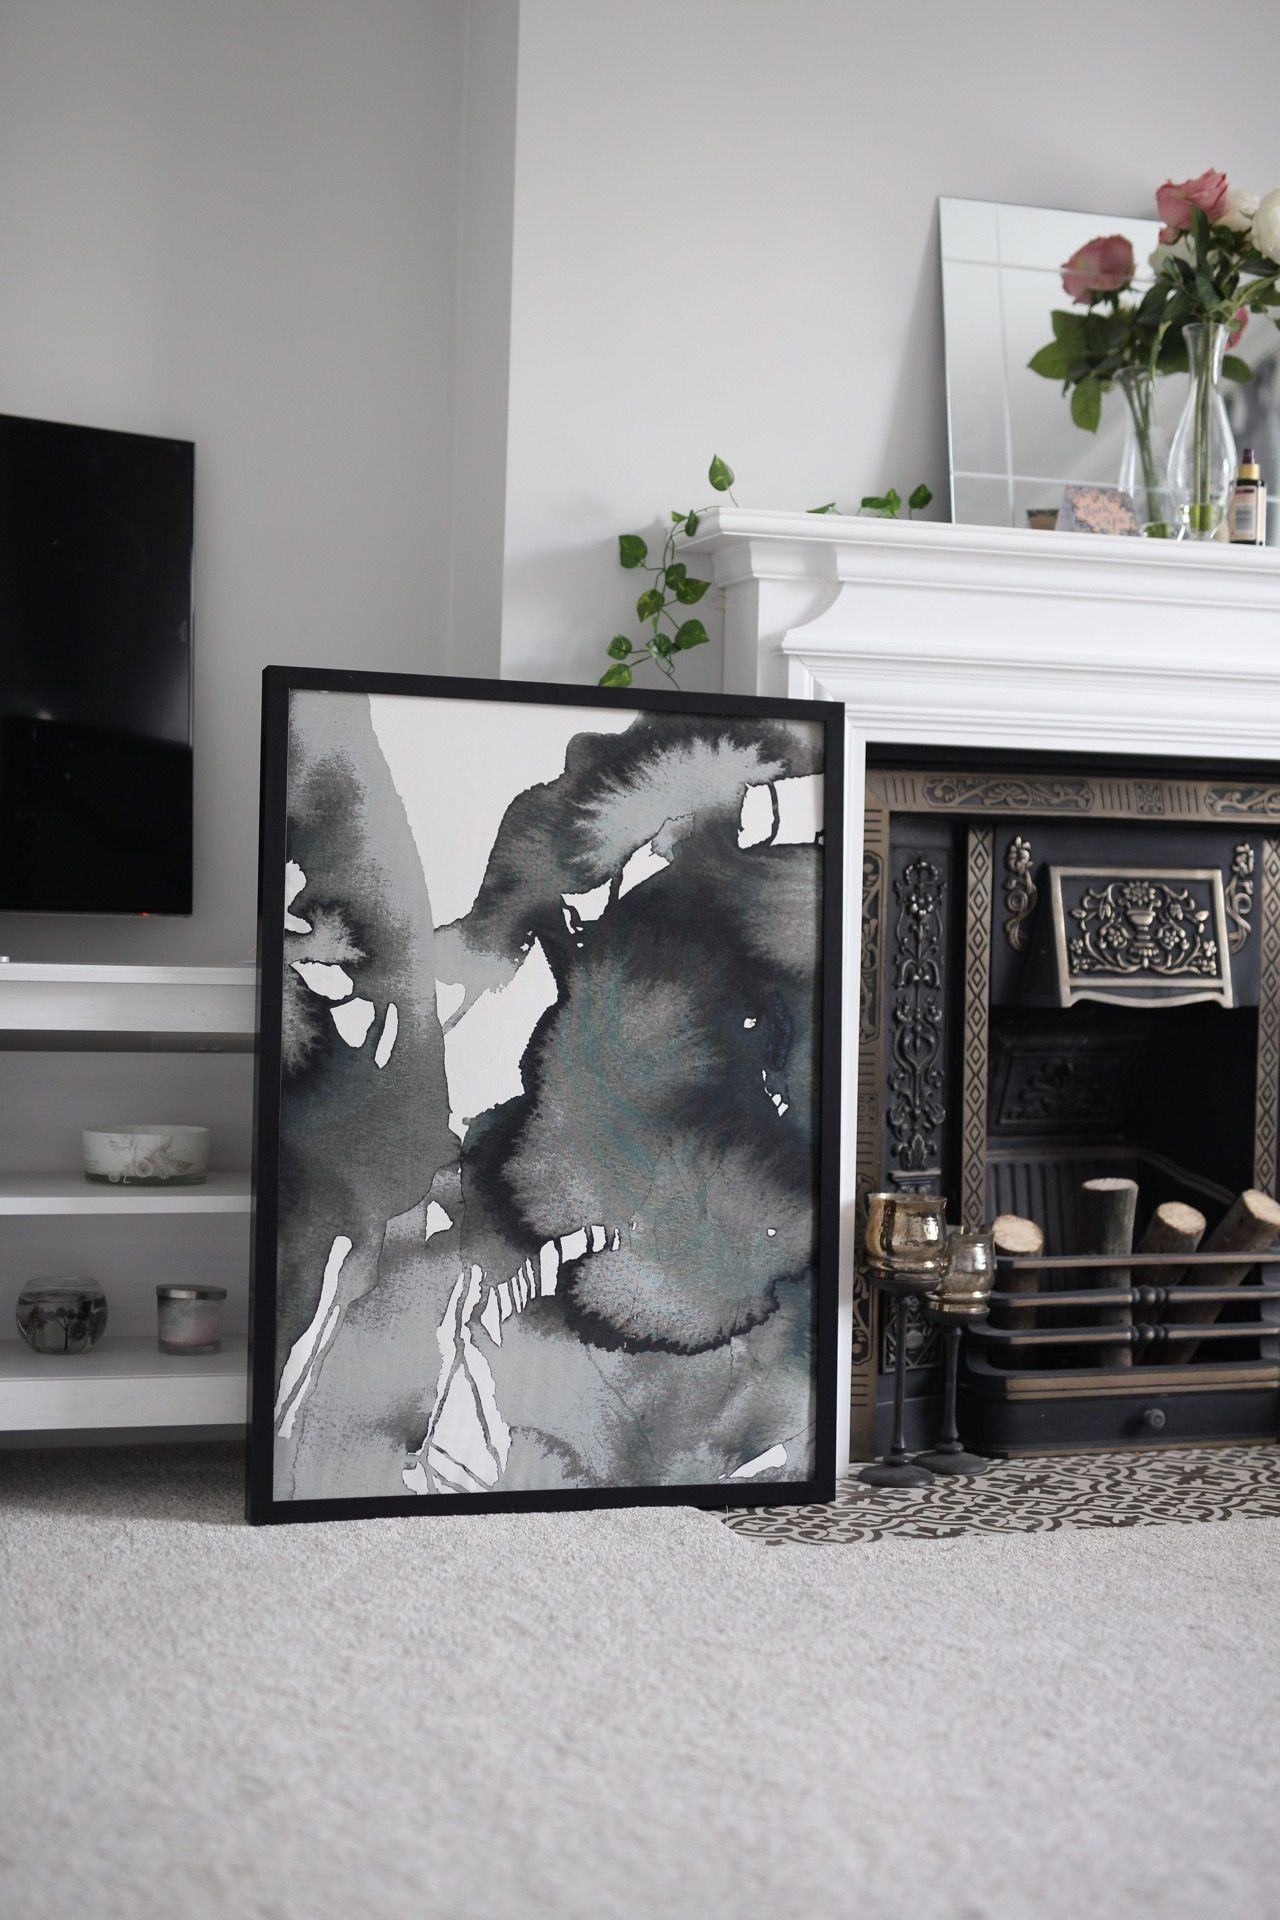 Ikea Nattglim Fabric Diy Wall Art Inredning Ideer Konst